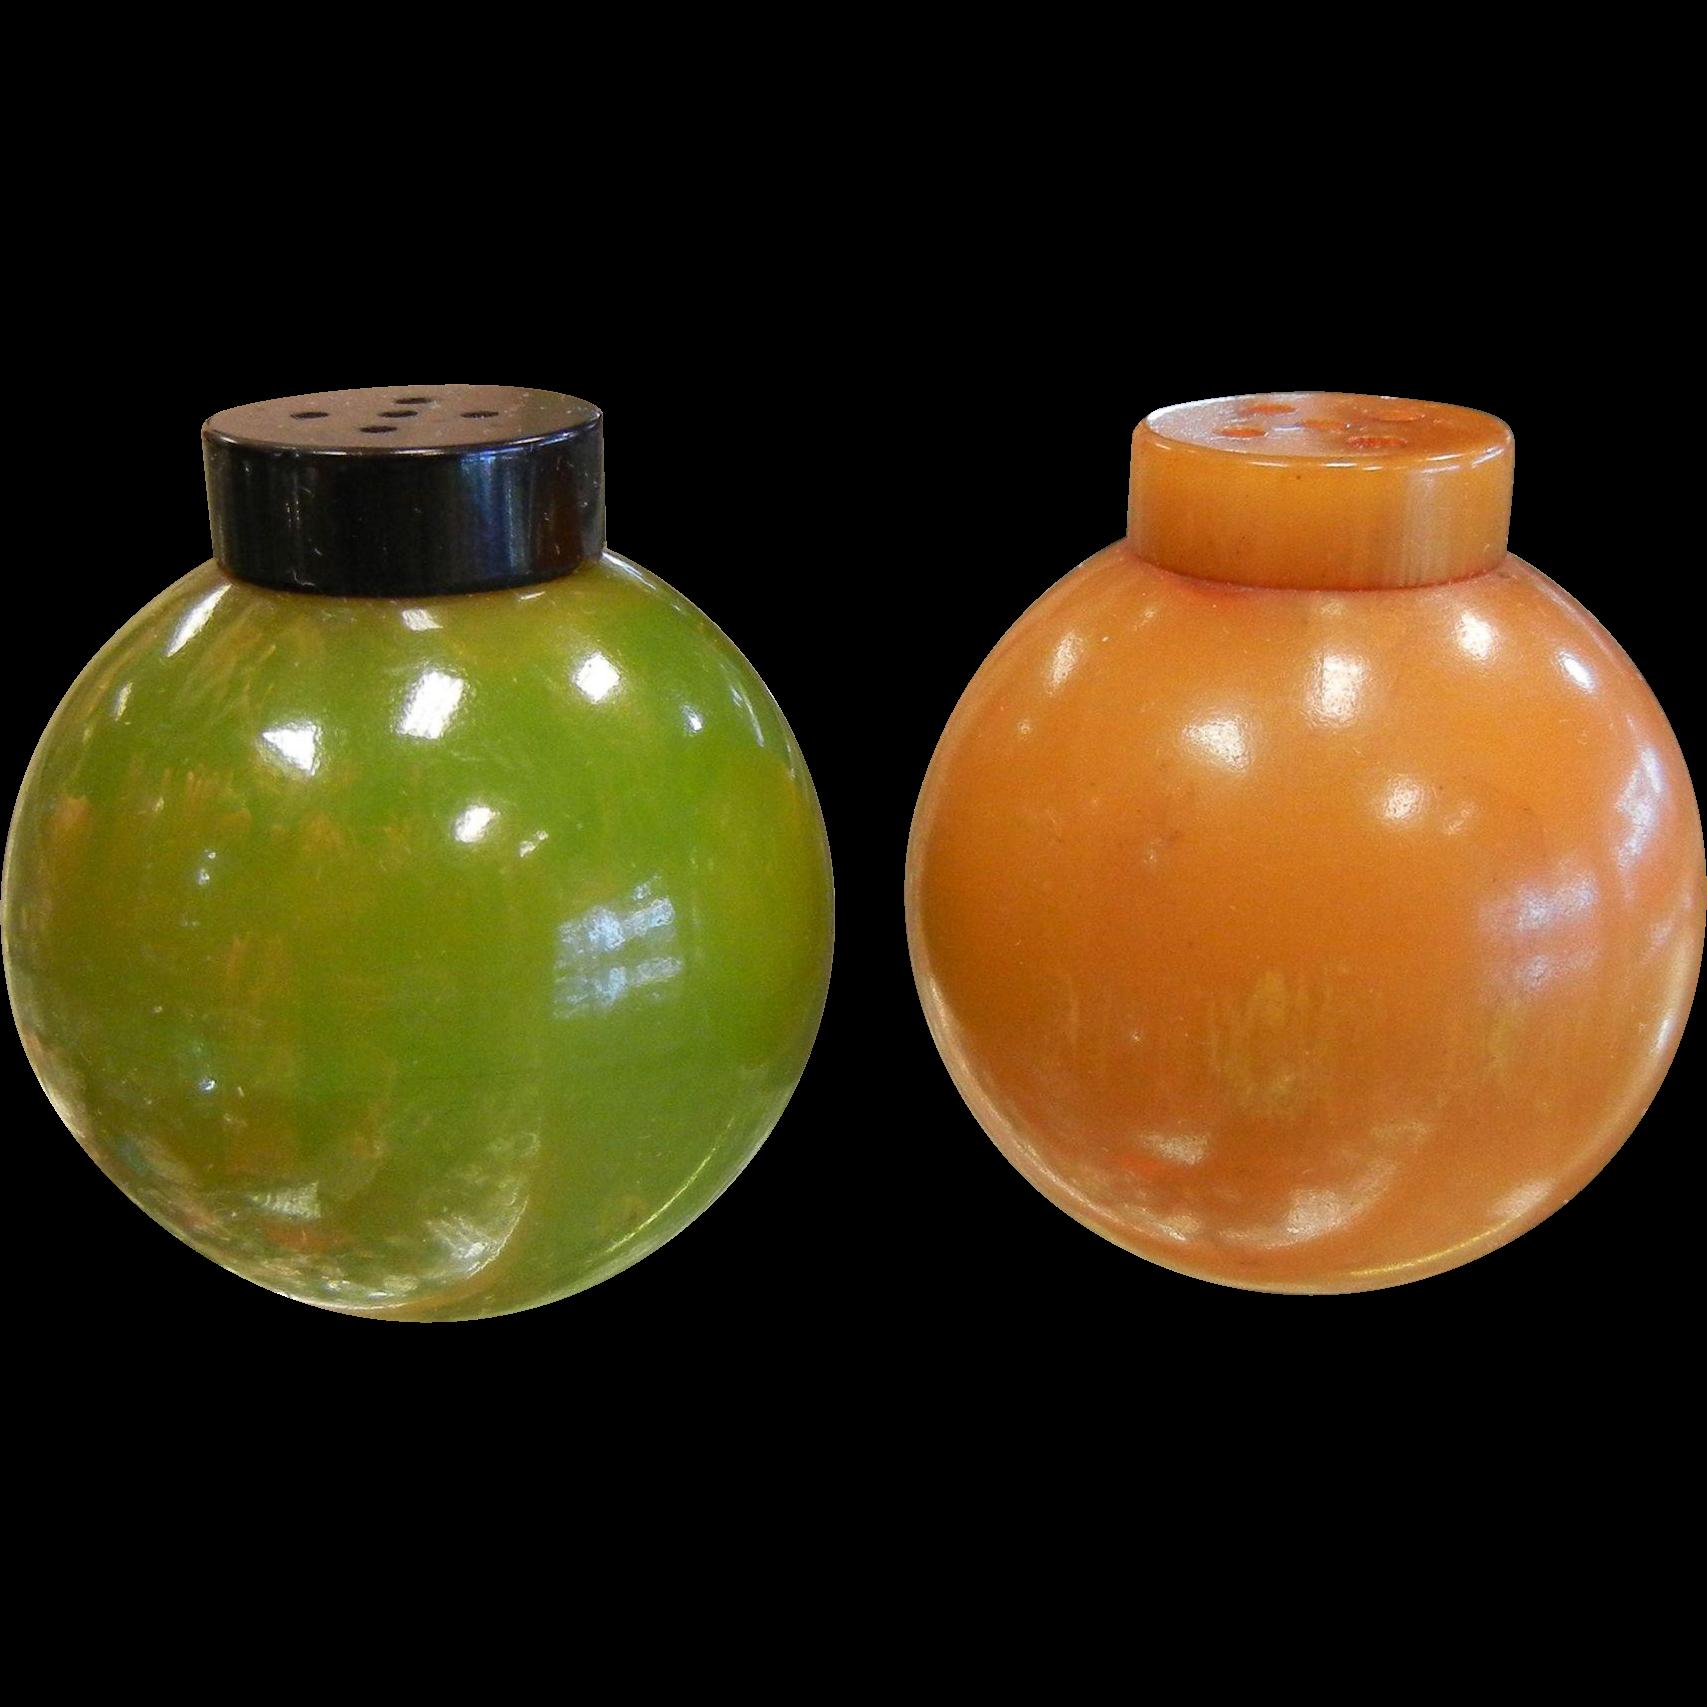 Vintage Catalin Plastic Salt & Pepper Shakers Red Brown & Green